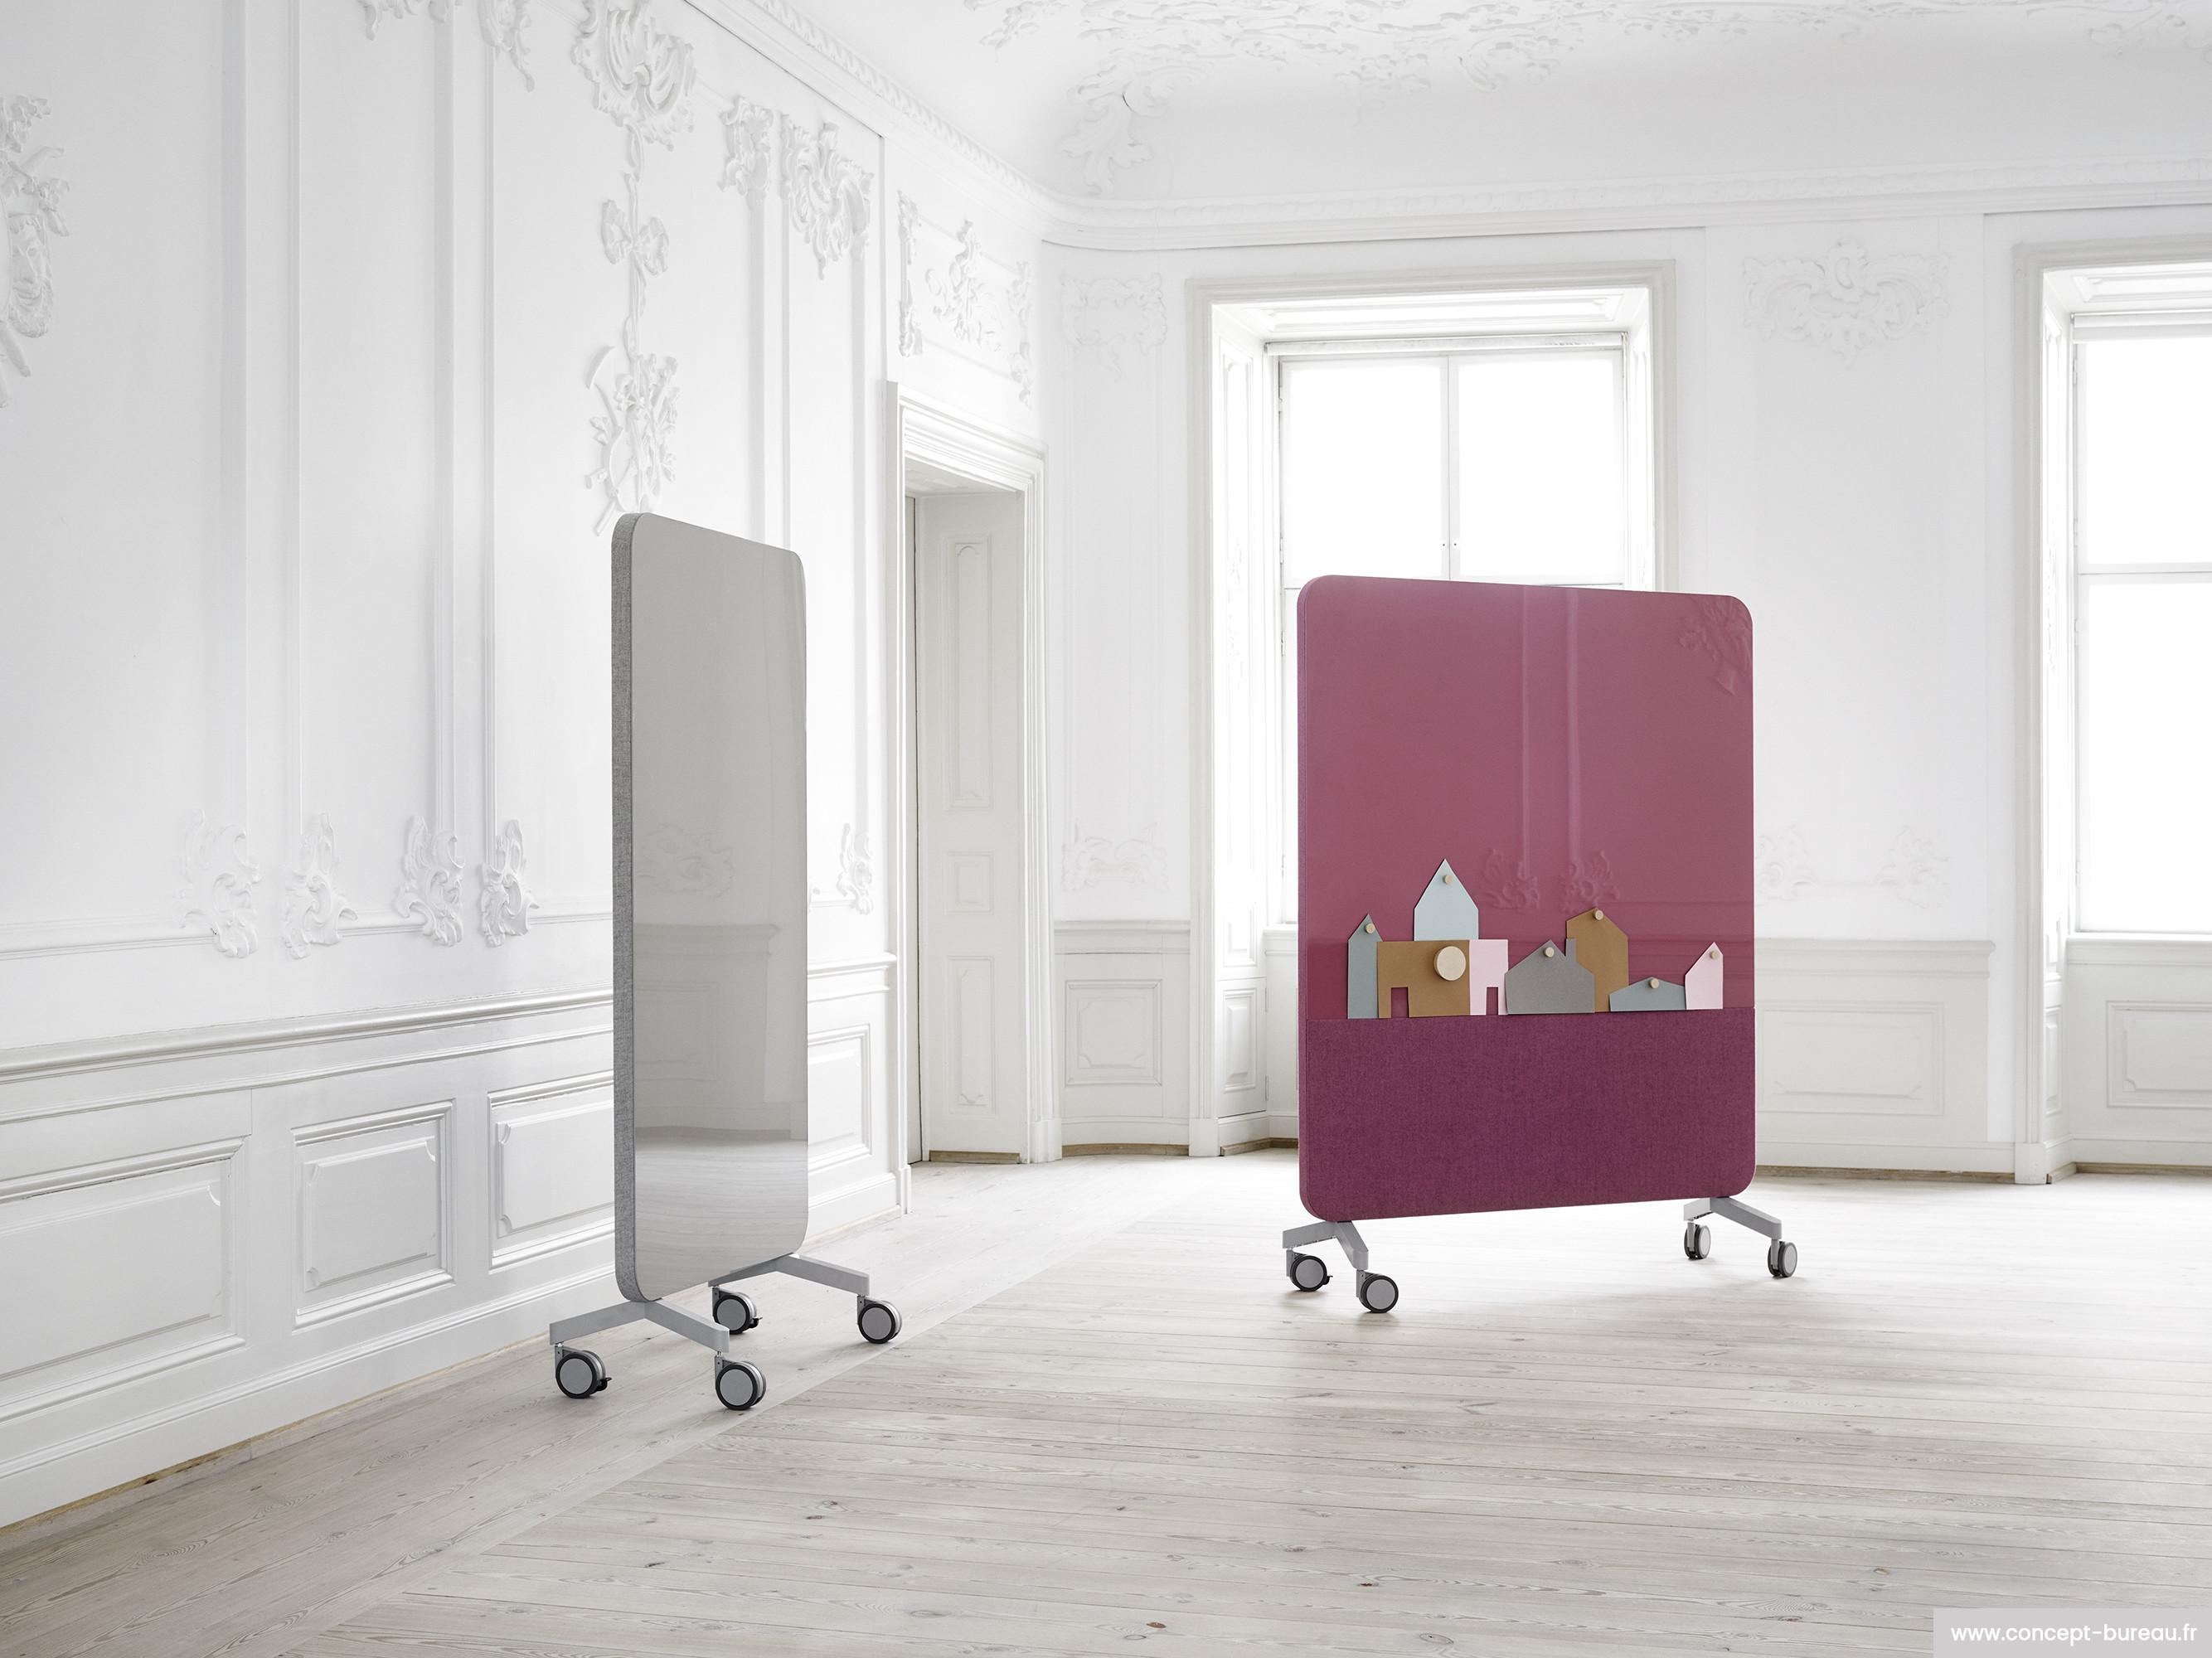 cloison mobile cloison amovible studio download by cloison mobile pour studio cloison mobile. Black Bedroom Furniture Sets. Home Design Ideas